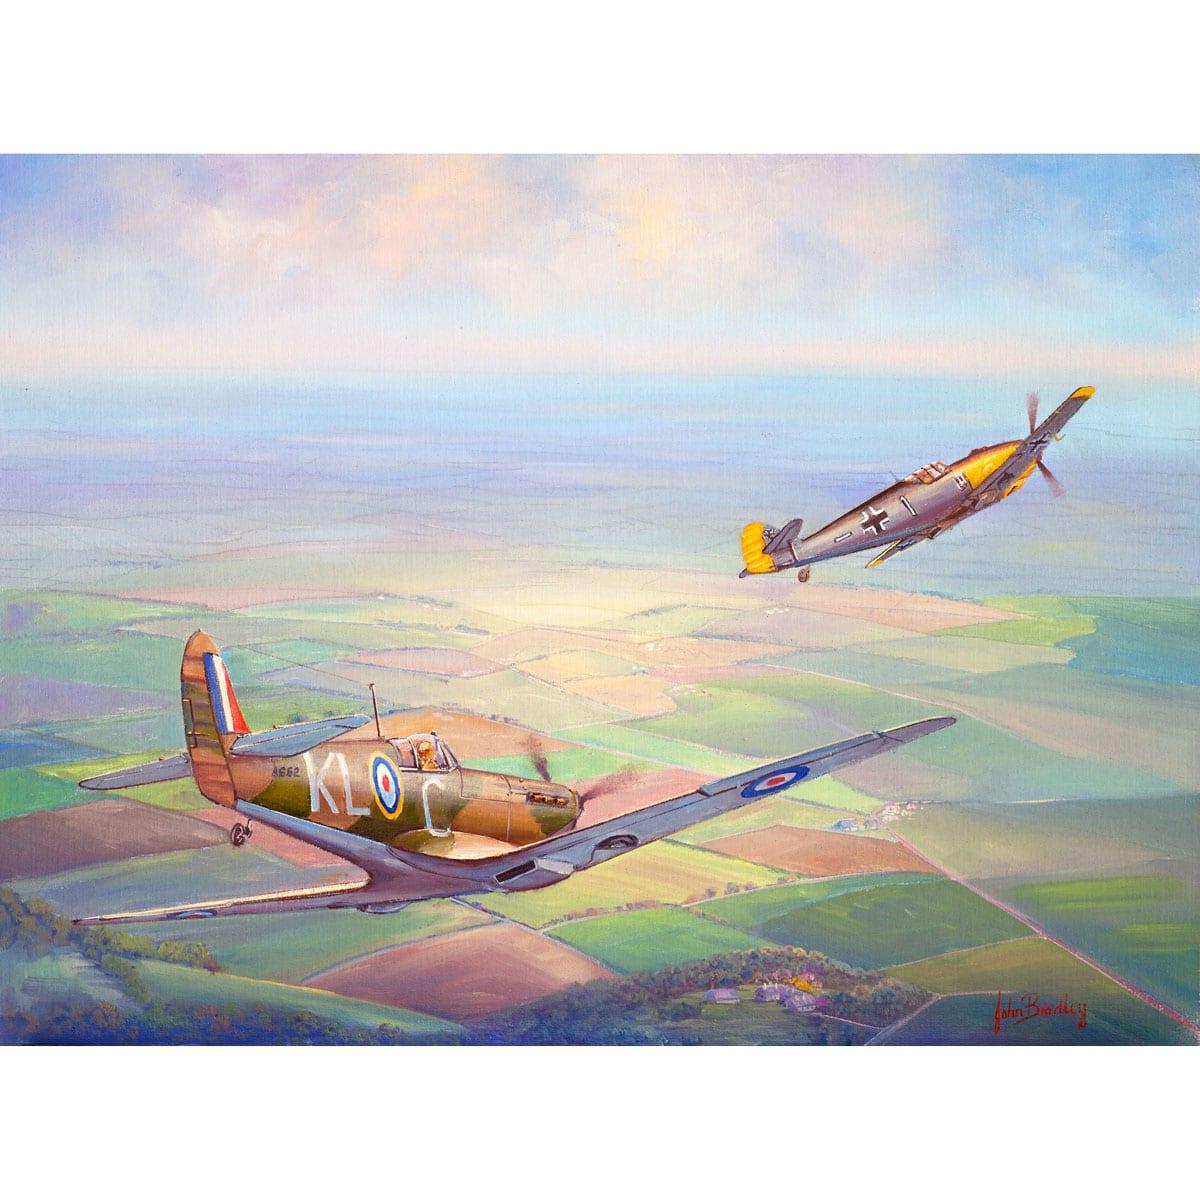 Nowhere to Hide Fighter Plane Painting John Bradley